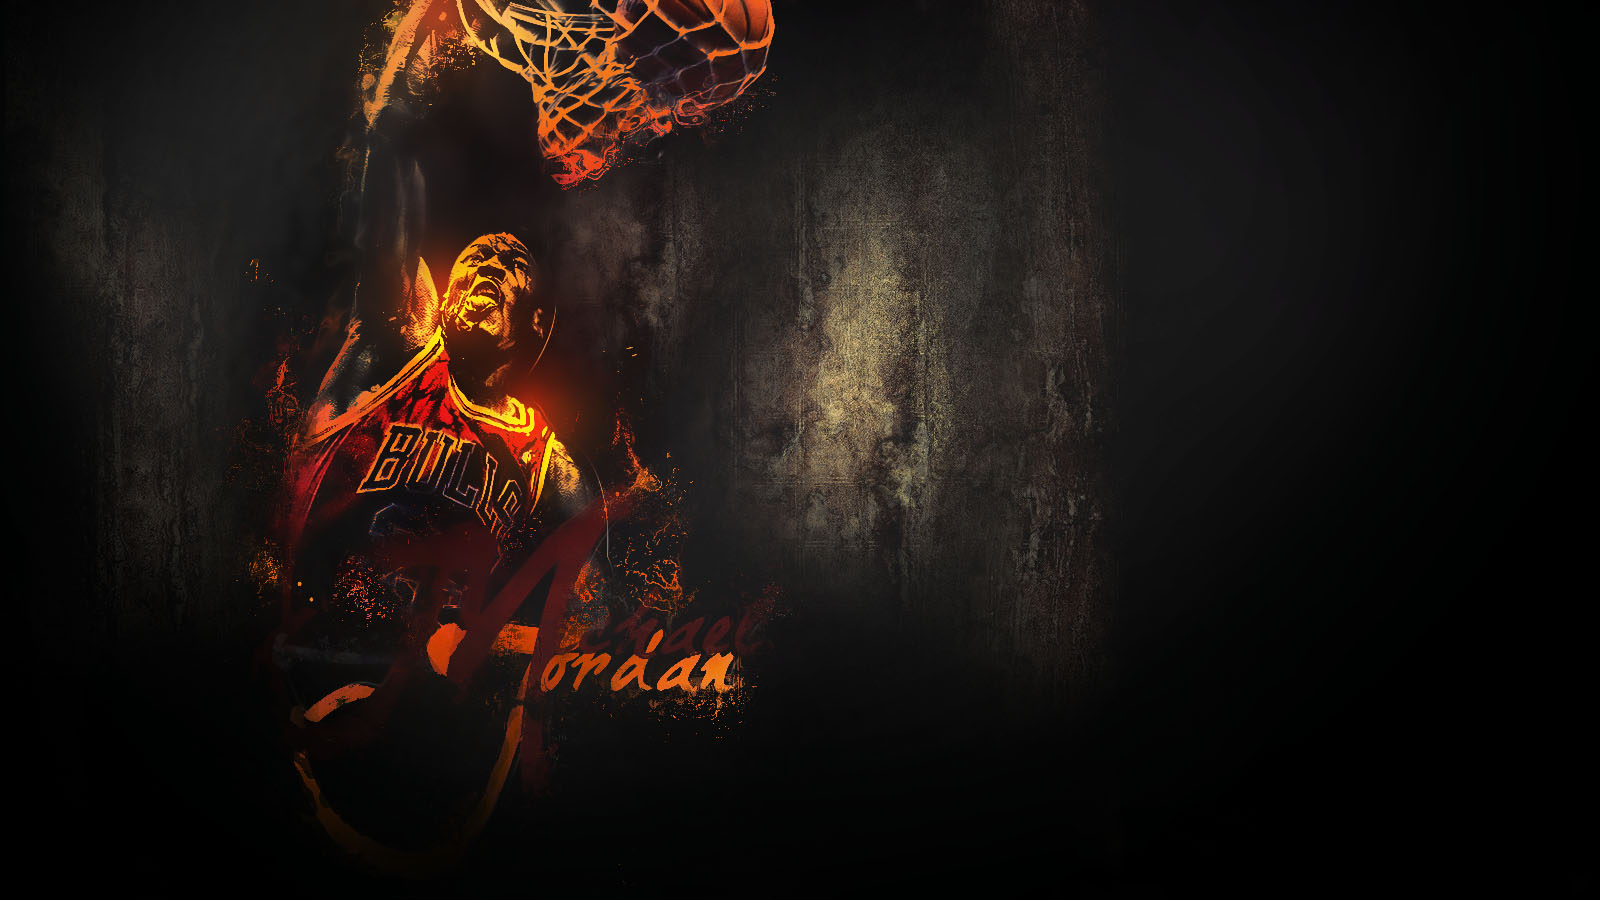 Good Wallpaper Logo Michael Jordan - Michael+Jordan+by+richyayo  Trends_366112.jpg